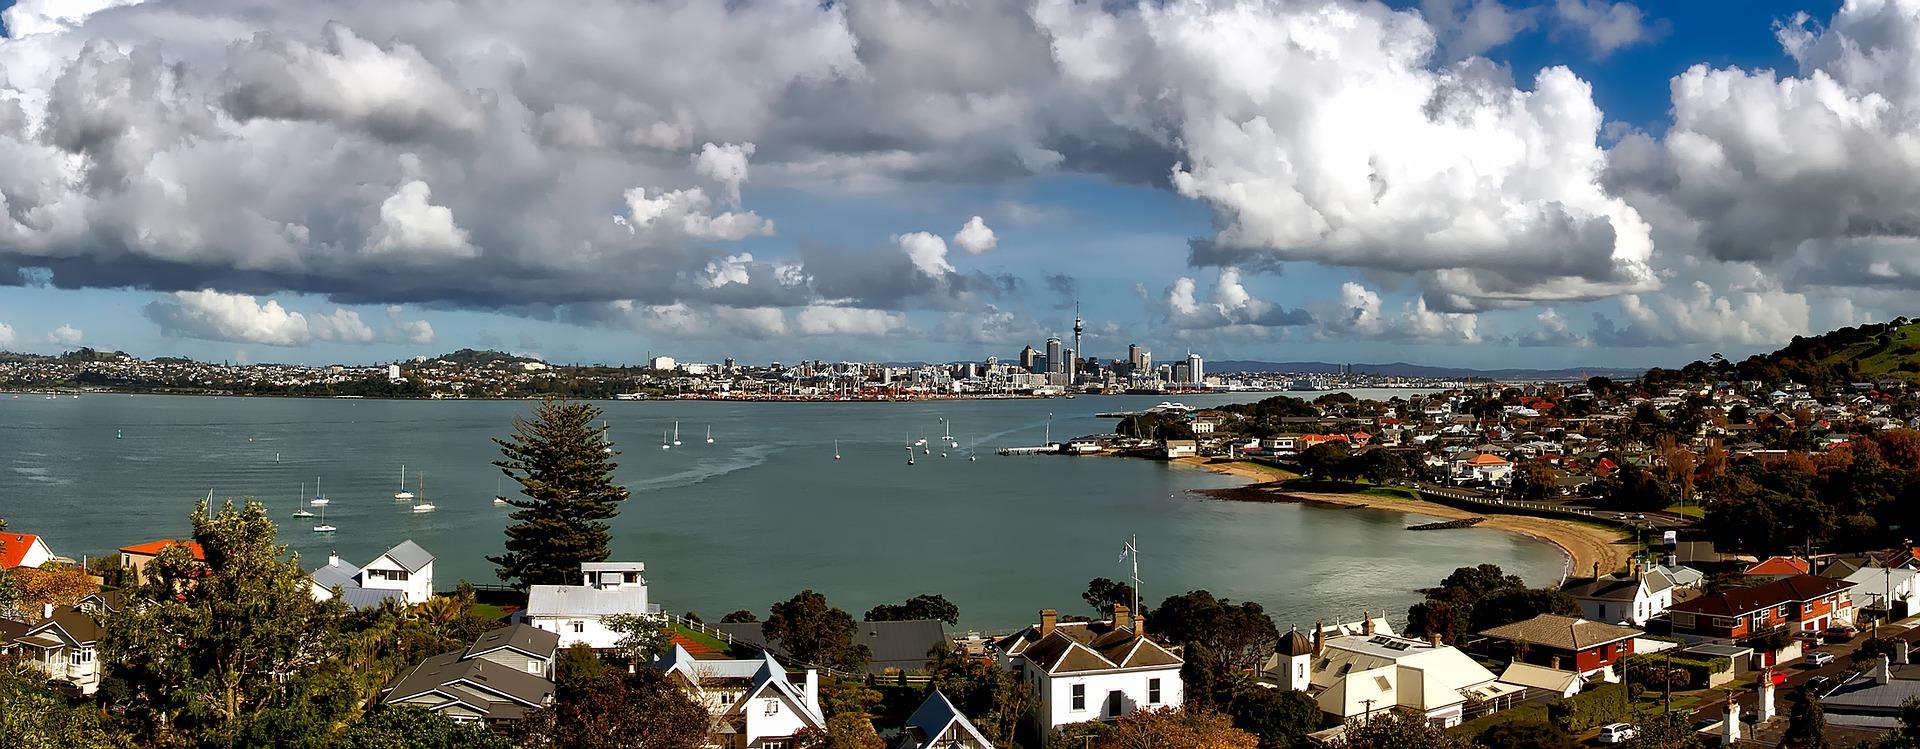 Aukland, New Zealand